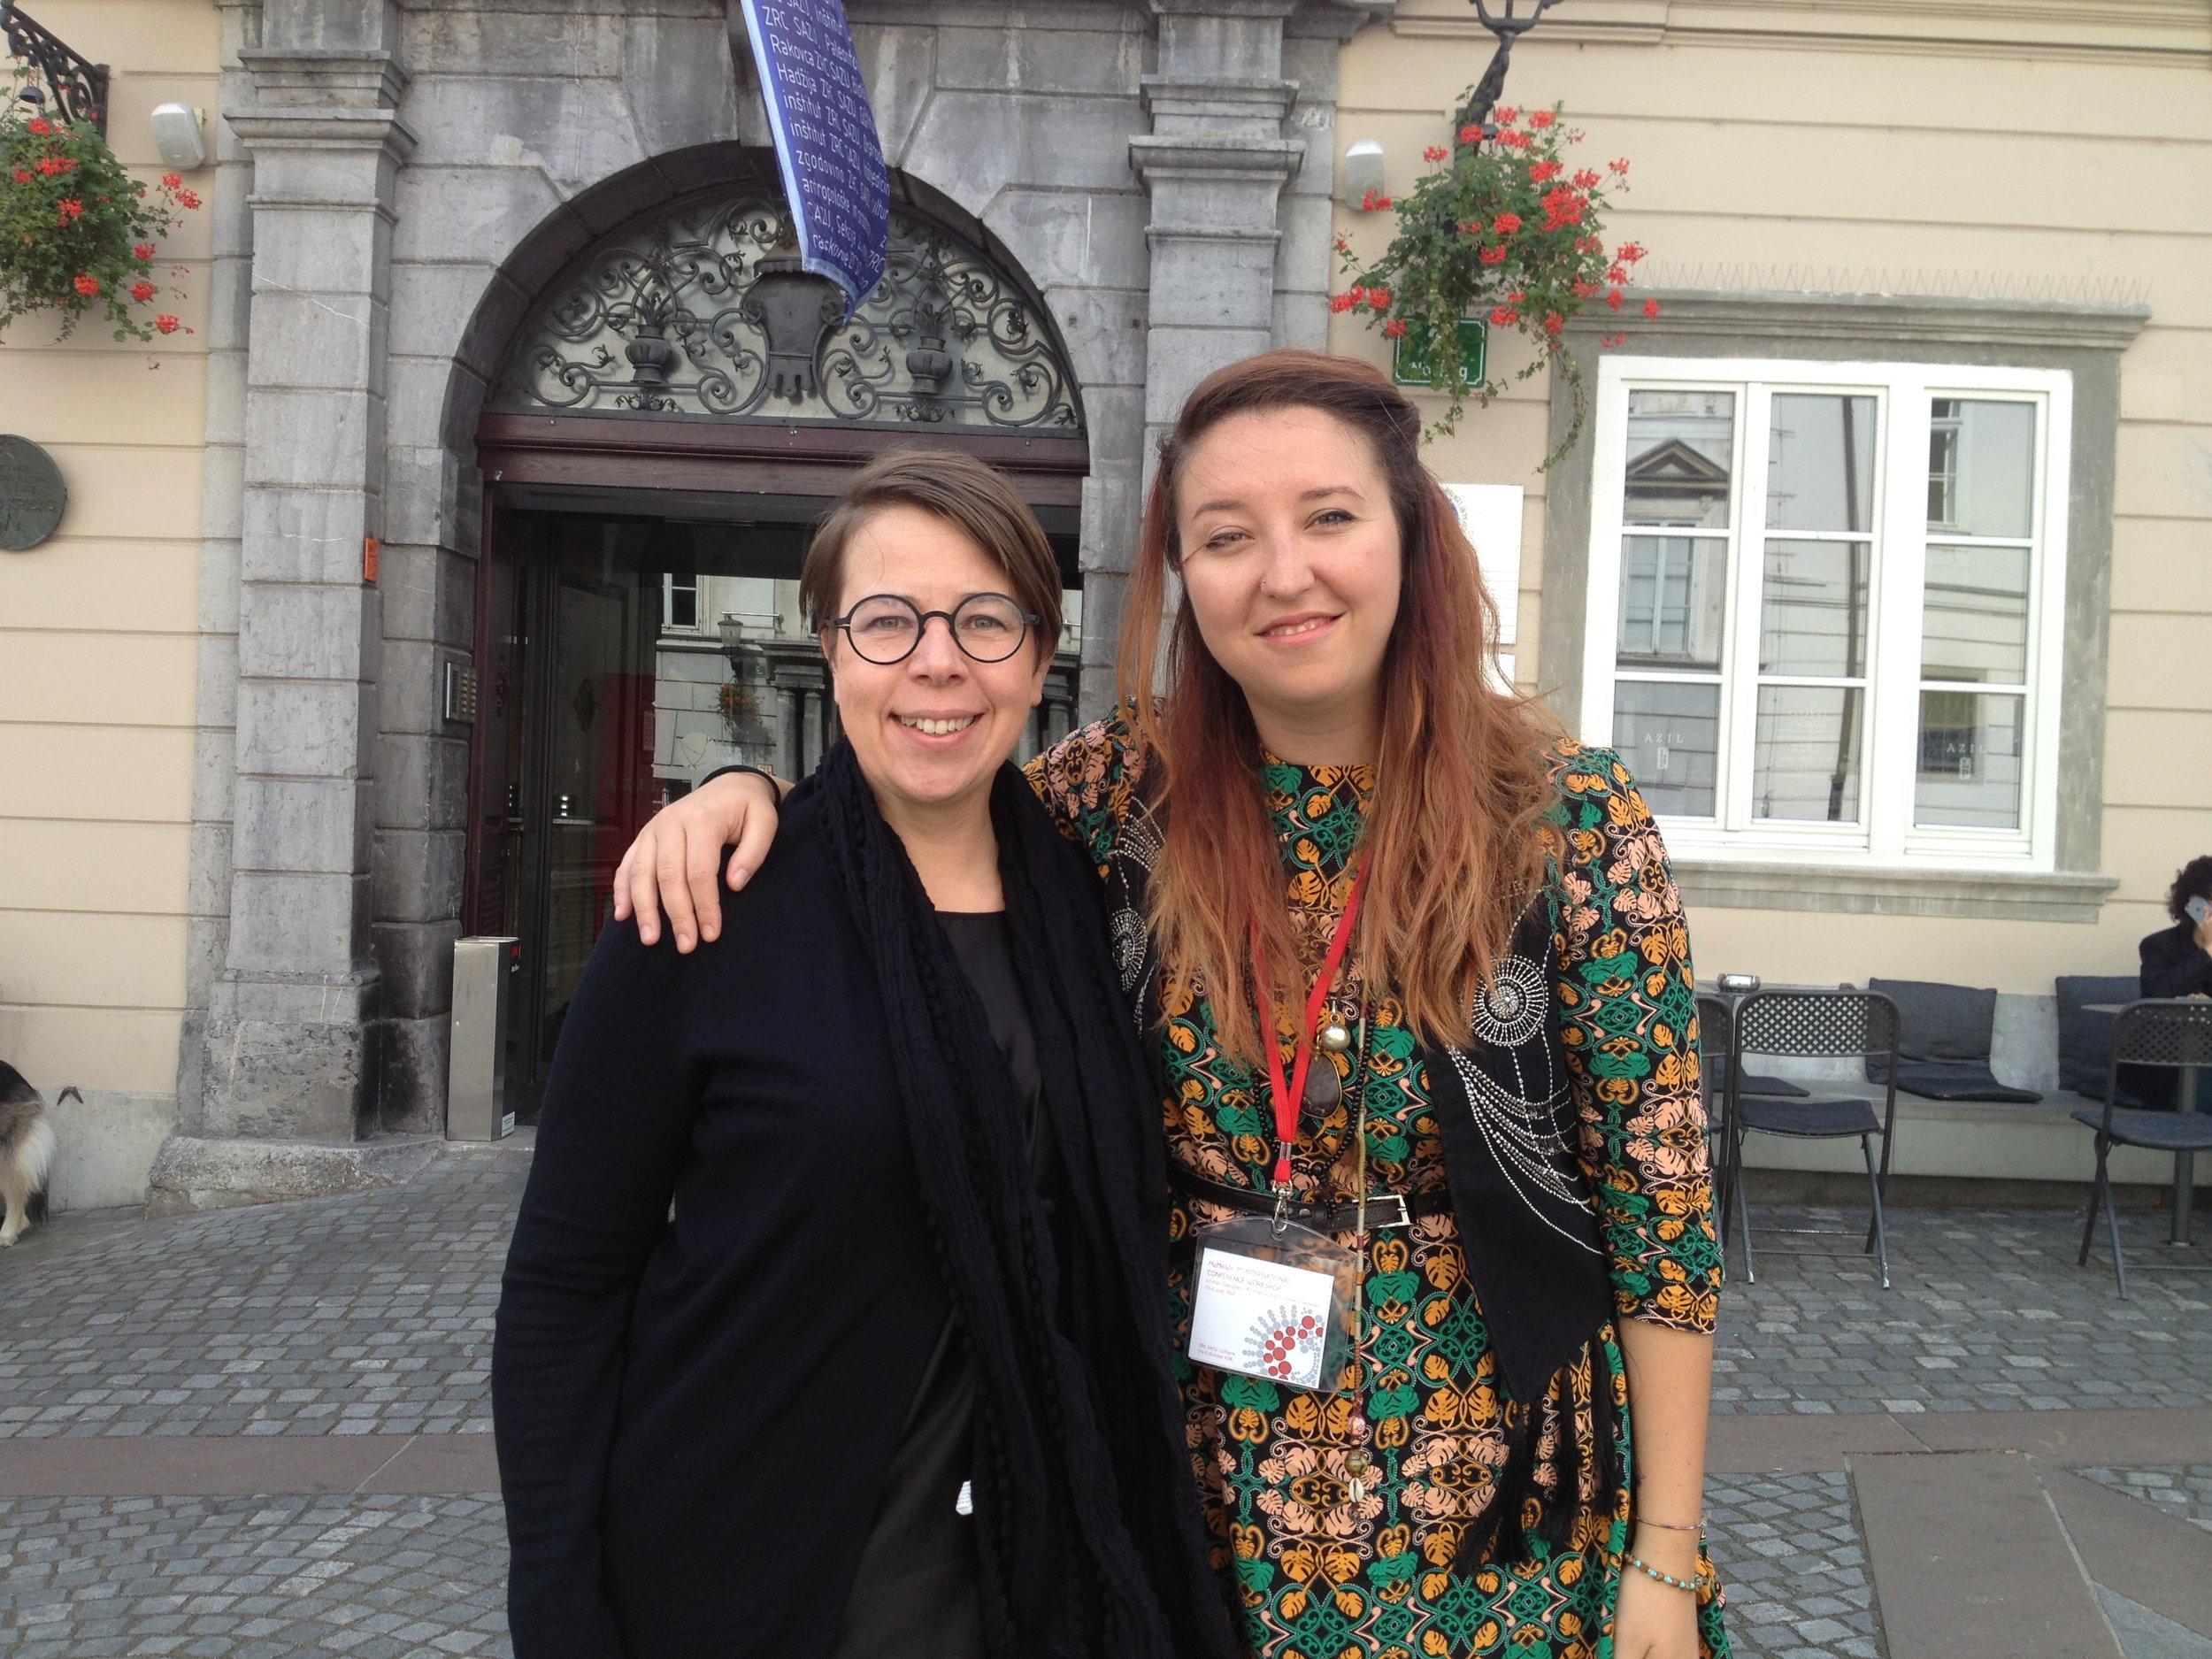 Tanja Poppelreuter (left) and Monica Prencipe (right), photo: Milota Sidorova (c)